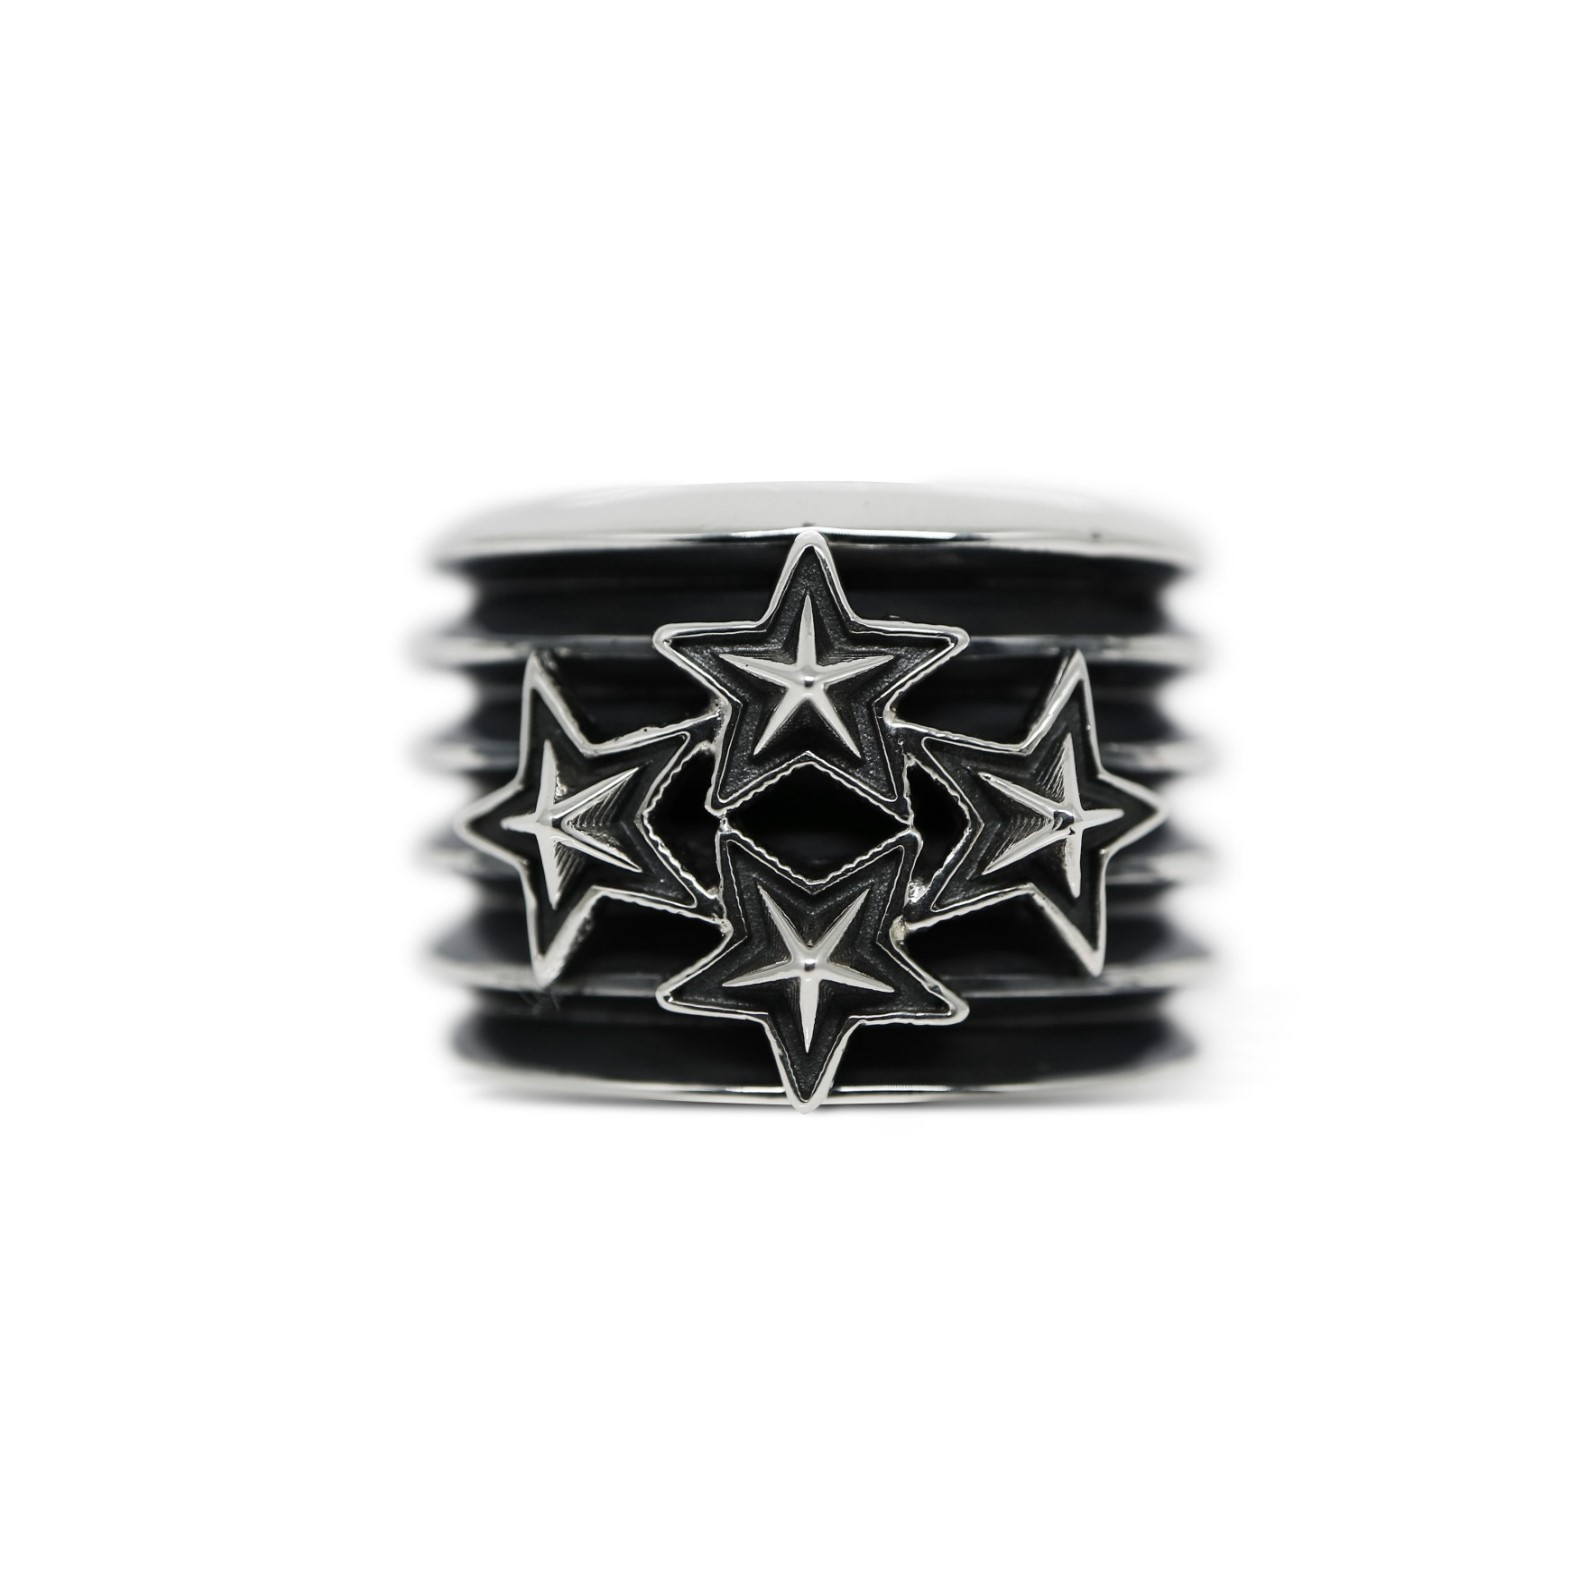 6 ROW W / 4 STARS RING [USD $730]